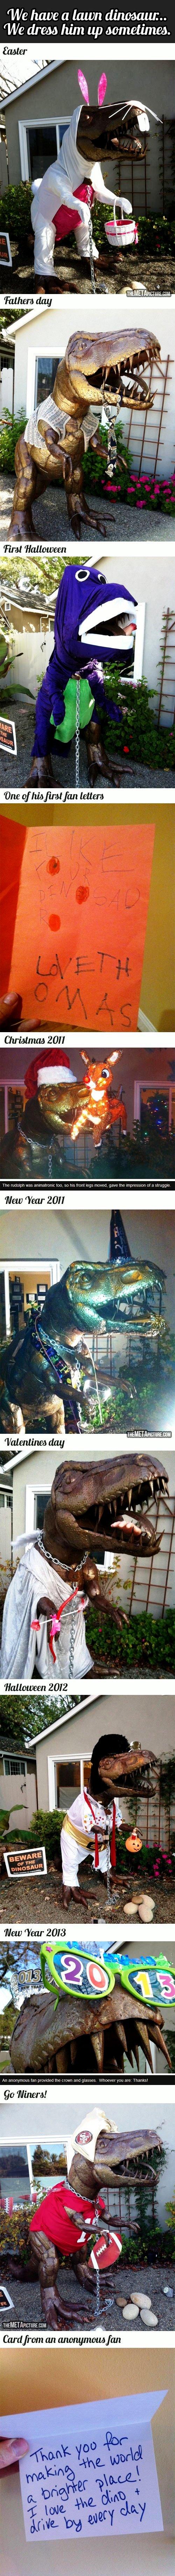 Lawn+Dinosaur_424097_4426844